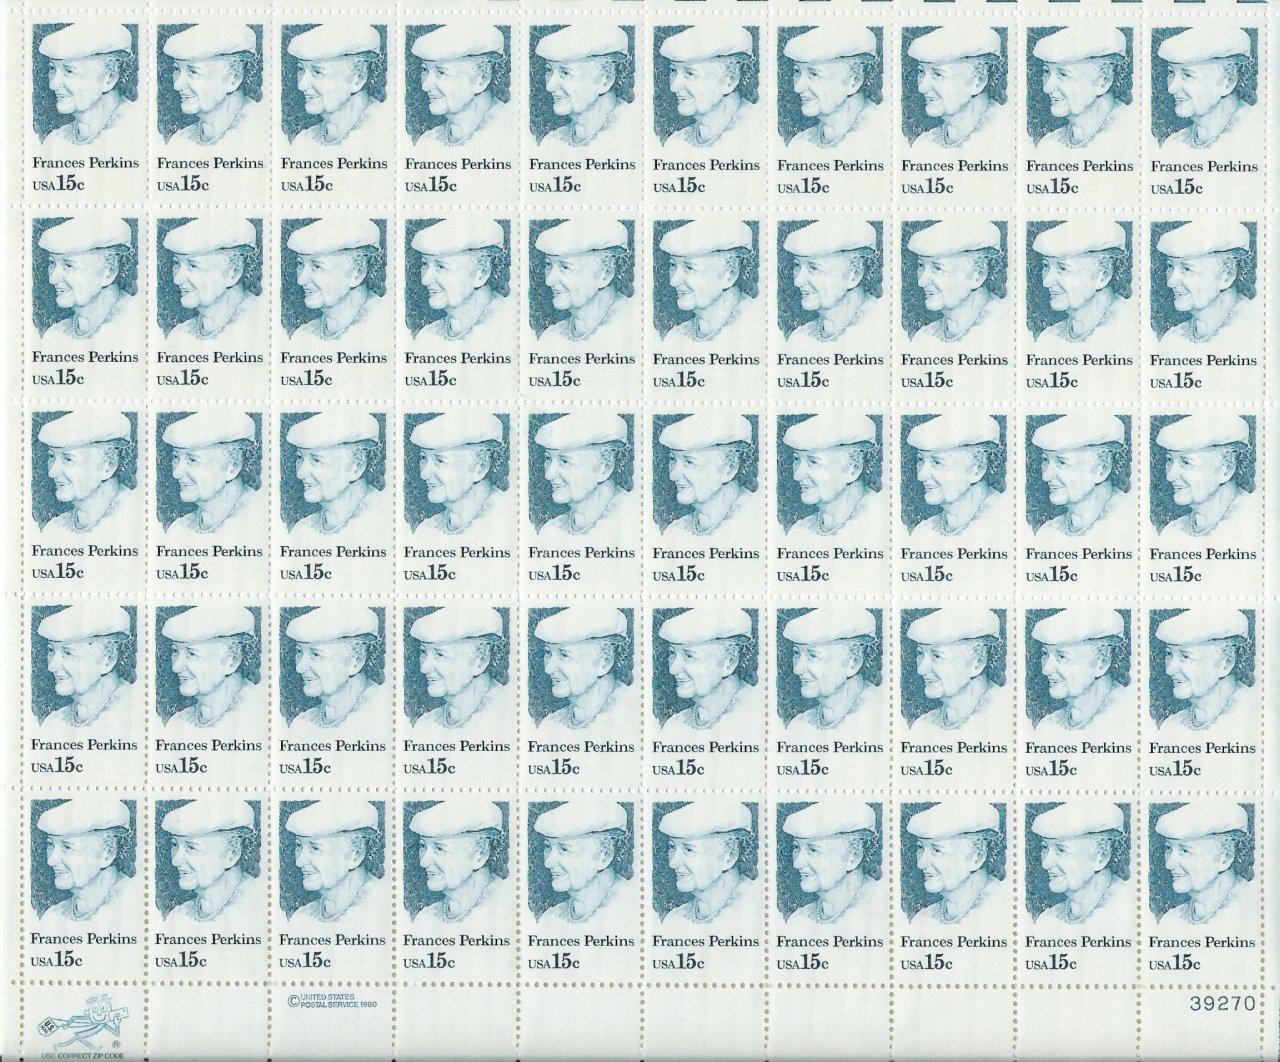 US Scott 1821 - Sheet of 50 - Francis Perkins - Mint Never Hinged